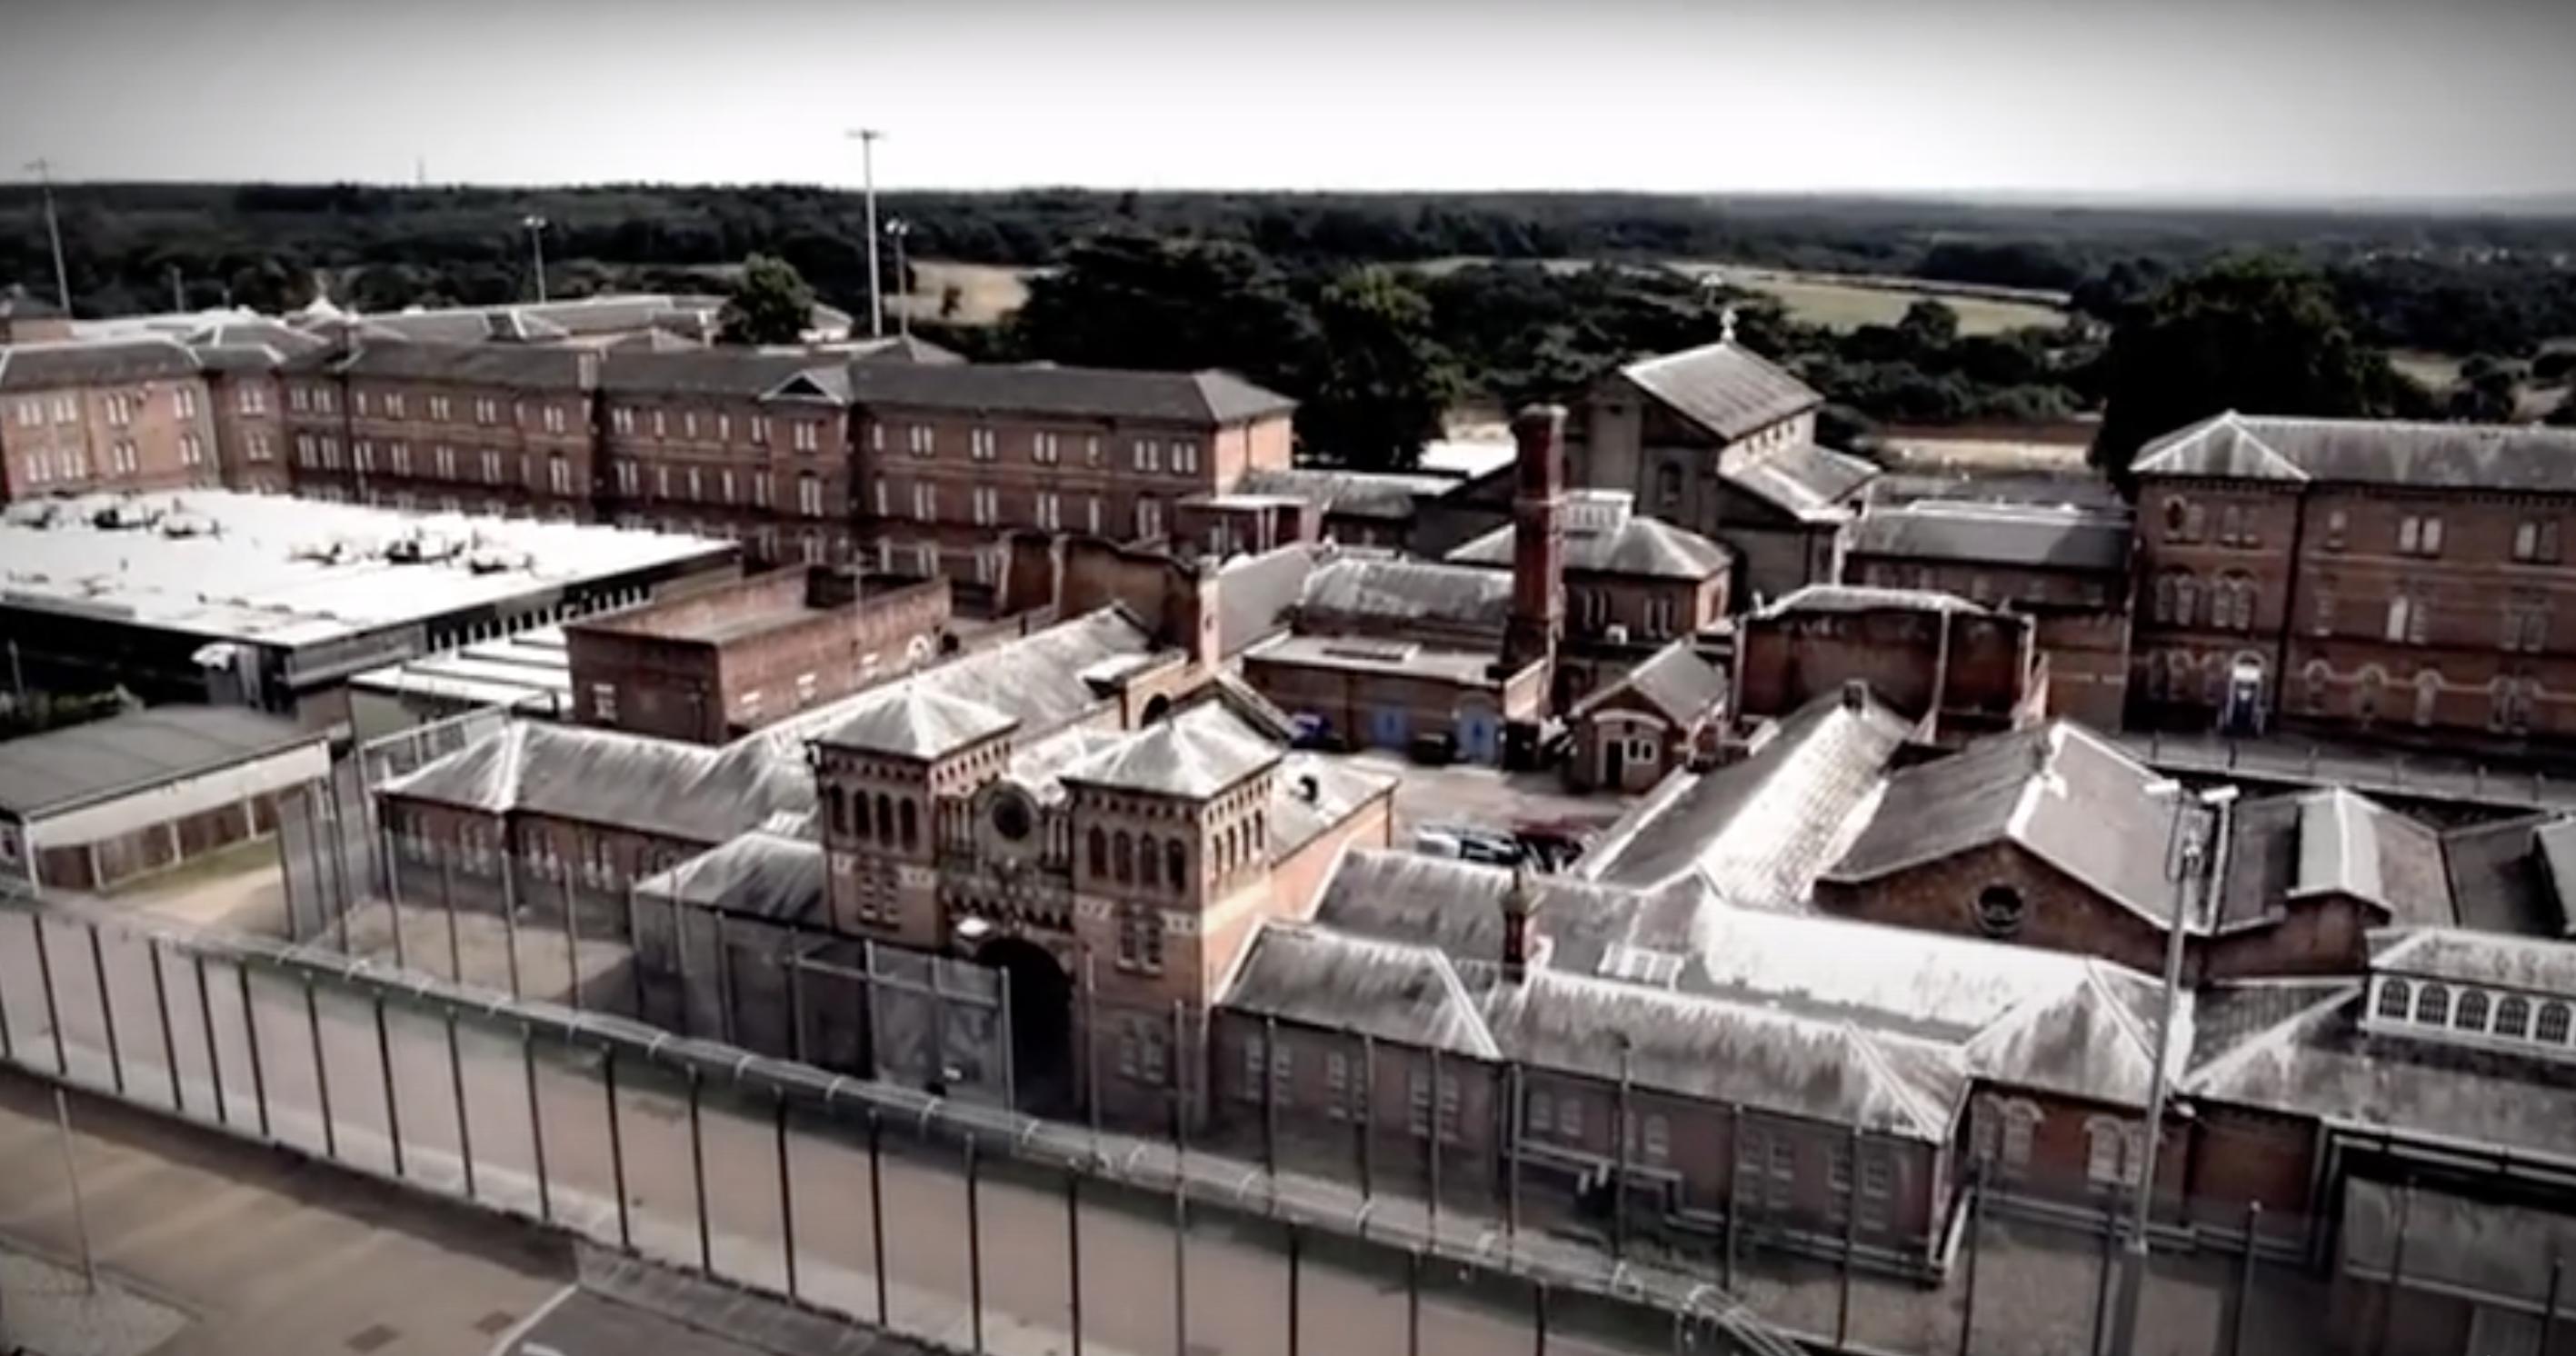 Broadmoor prisoners (Credit: ITV)